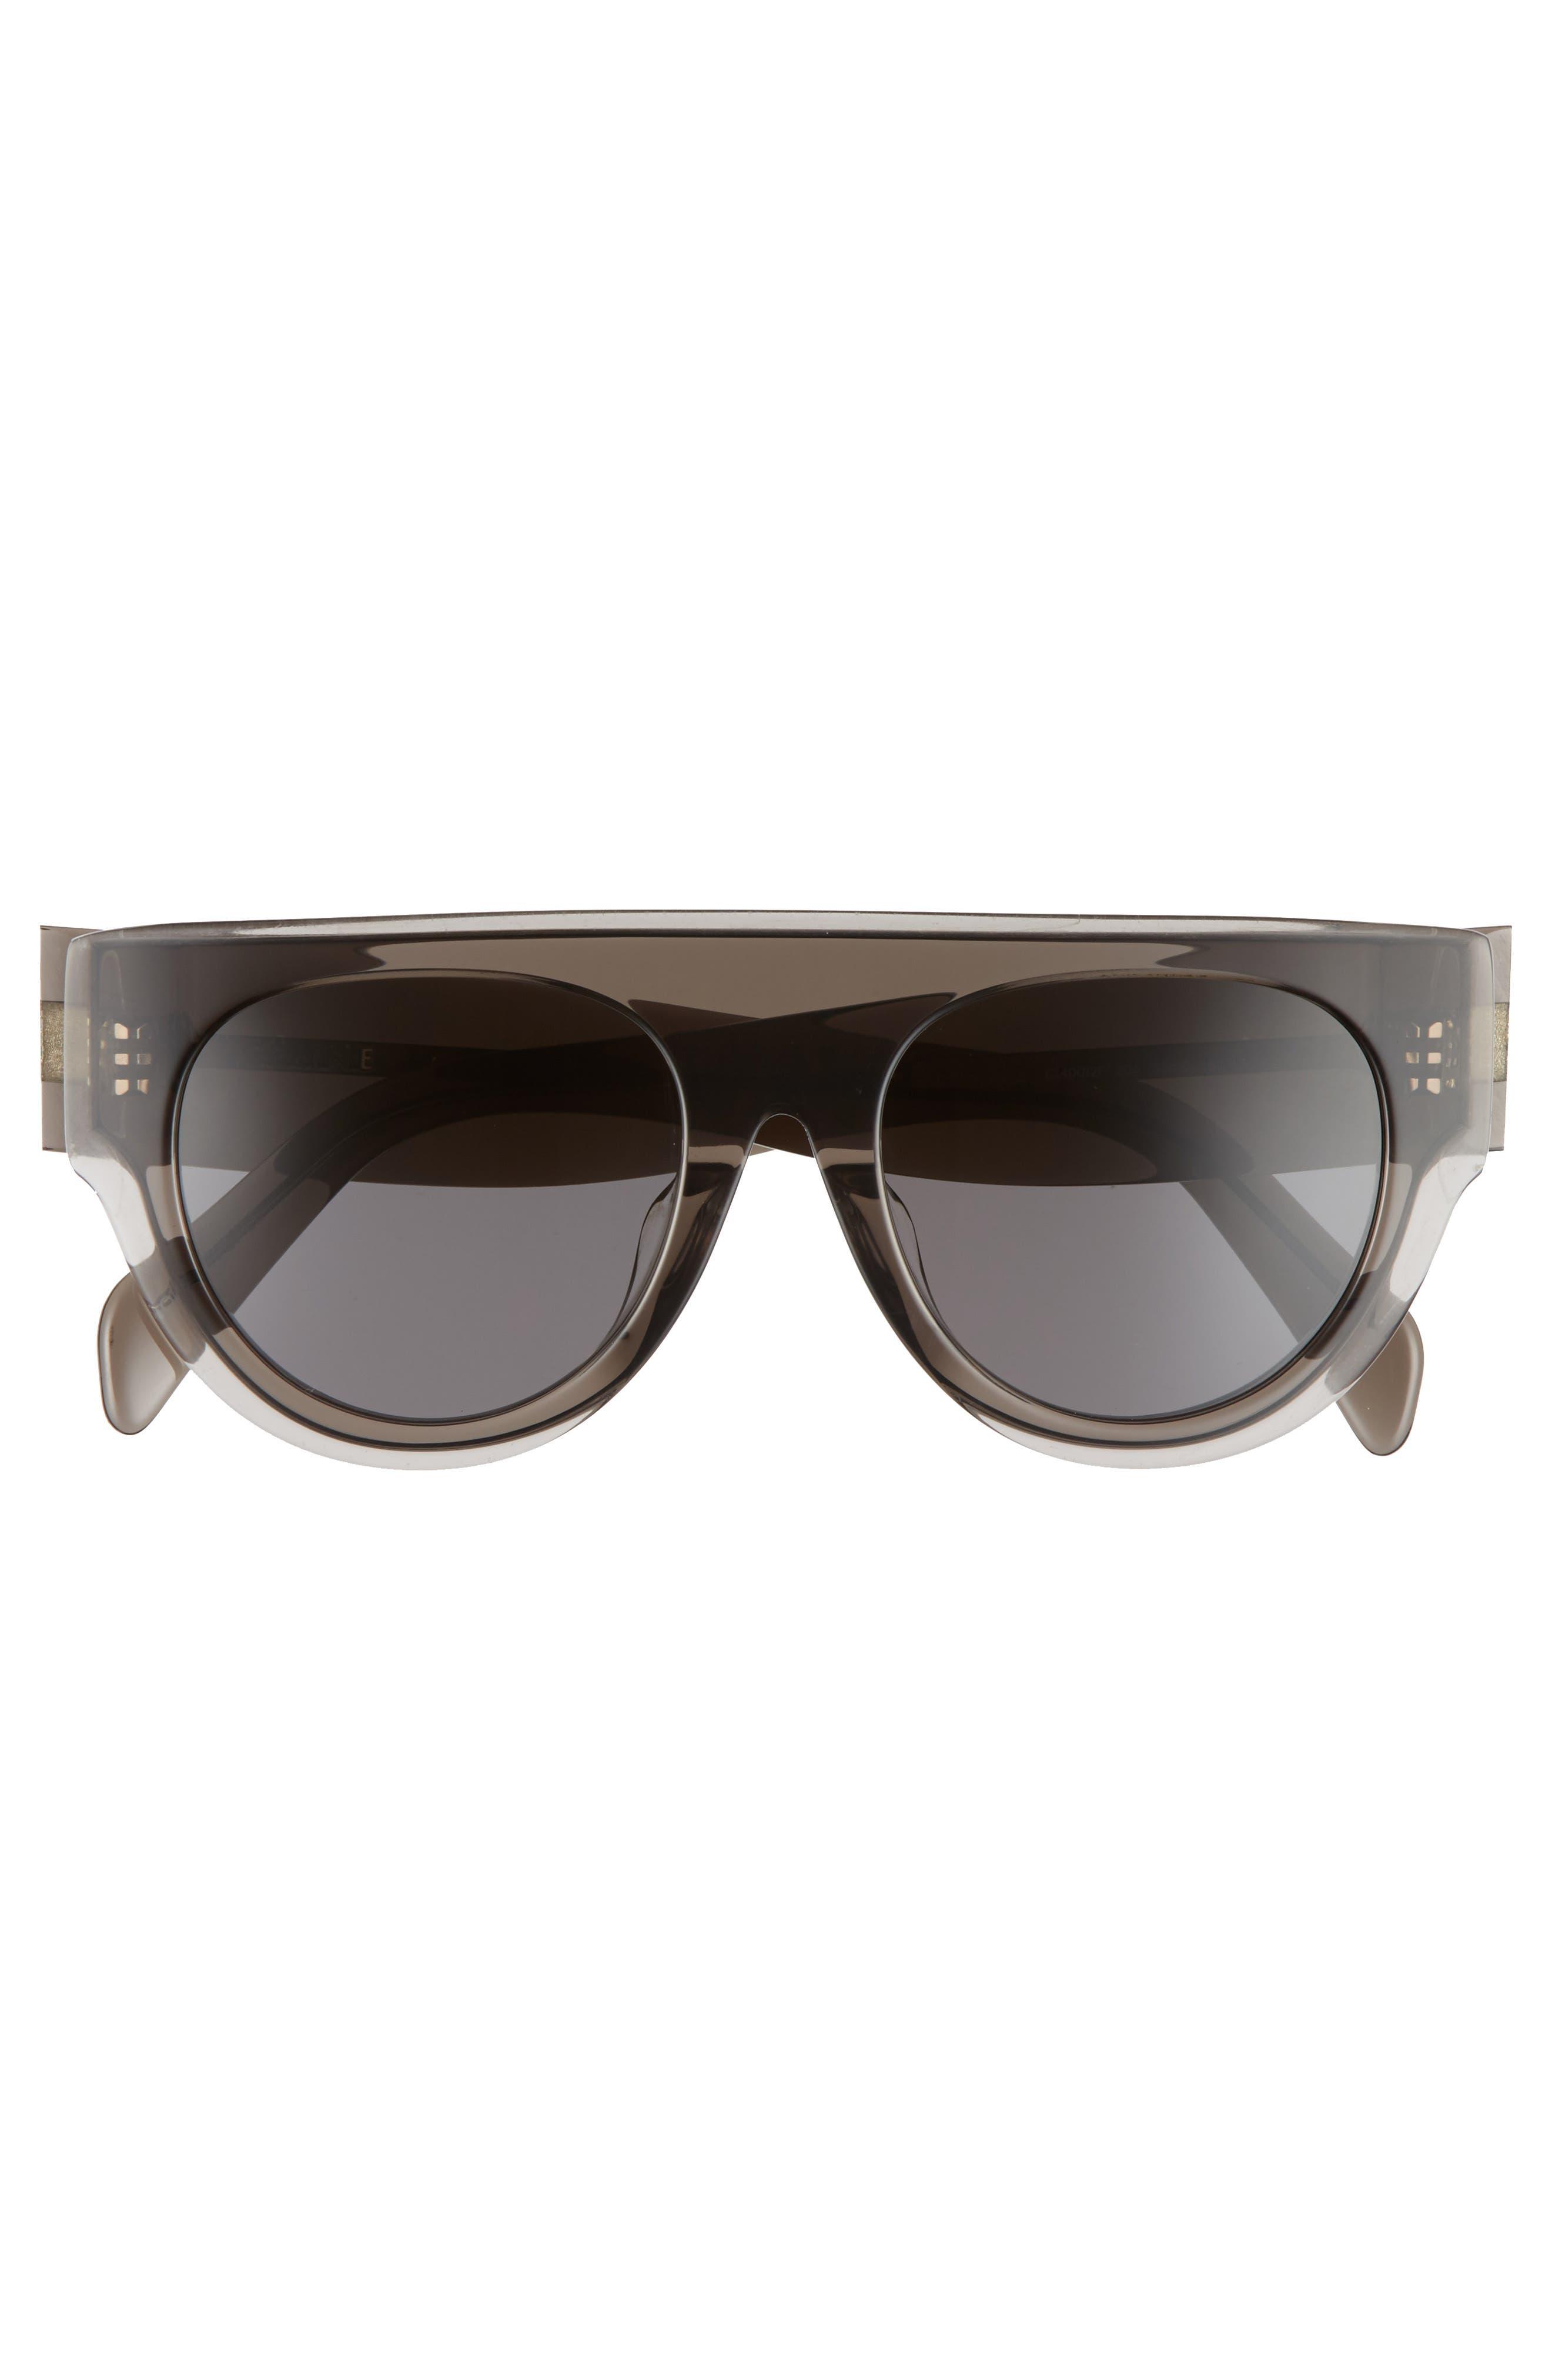 52mm Pilot Sunglasses,                             Alternate thumbnail 3, color,                             026